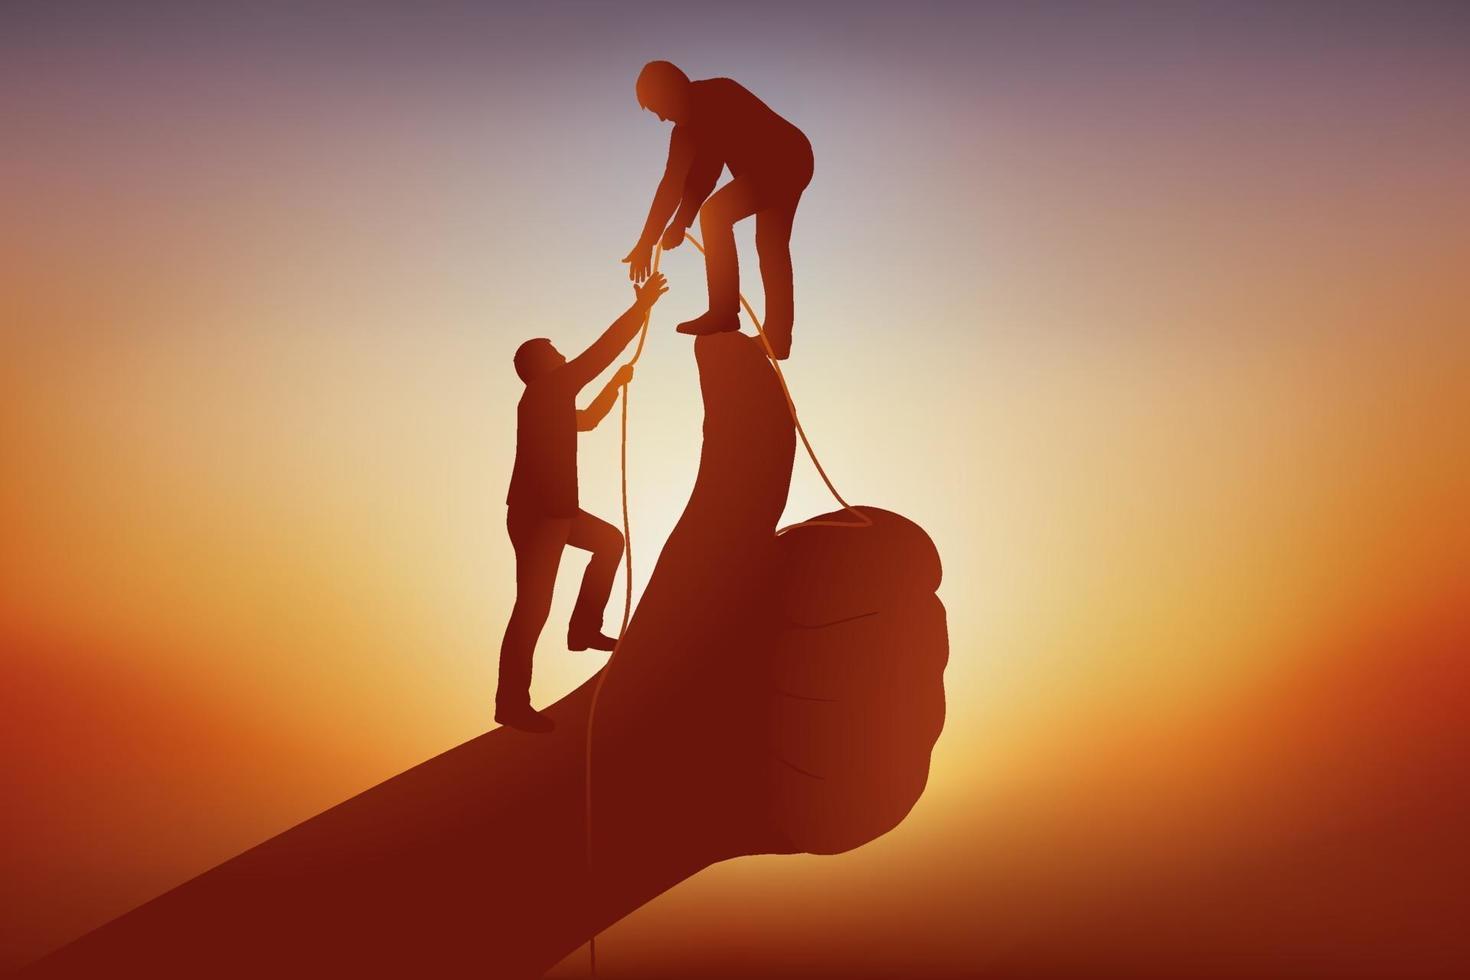 concepto de ayuda mutua entre socios comerciales 2116761 Vector en Vecteezy